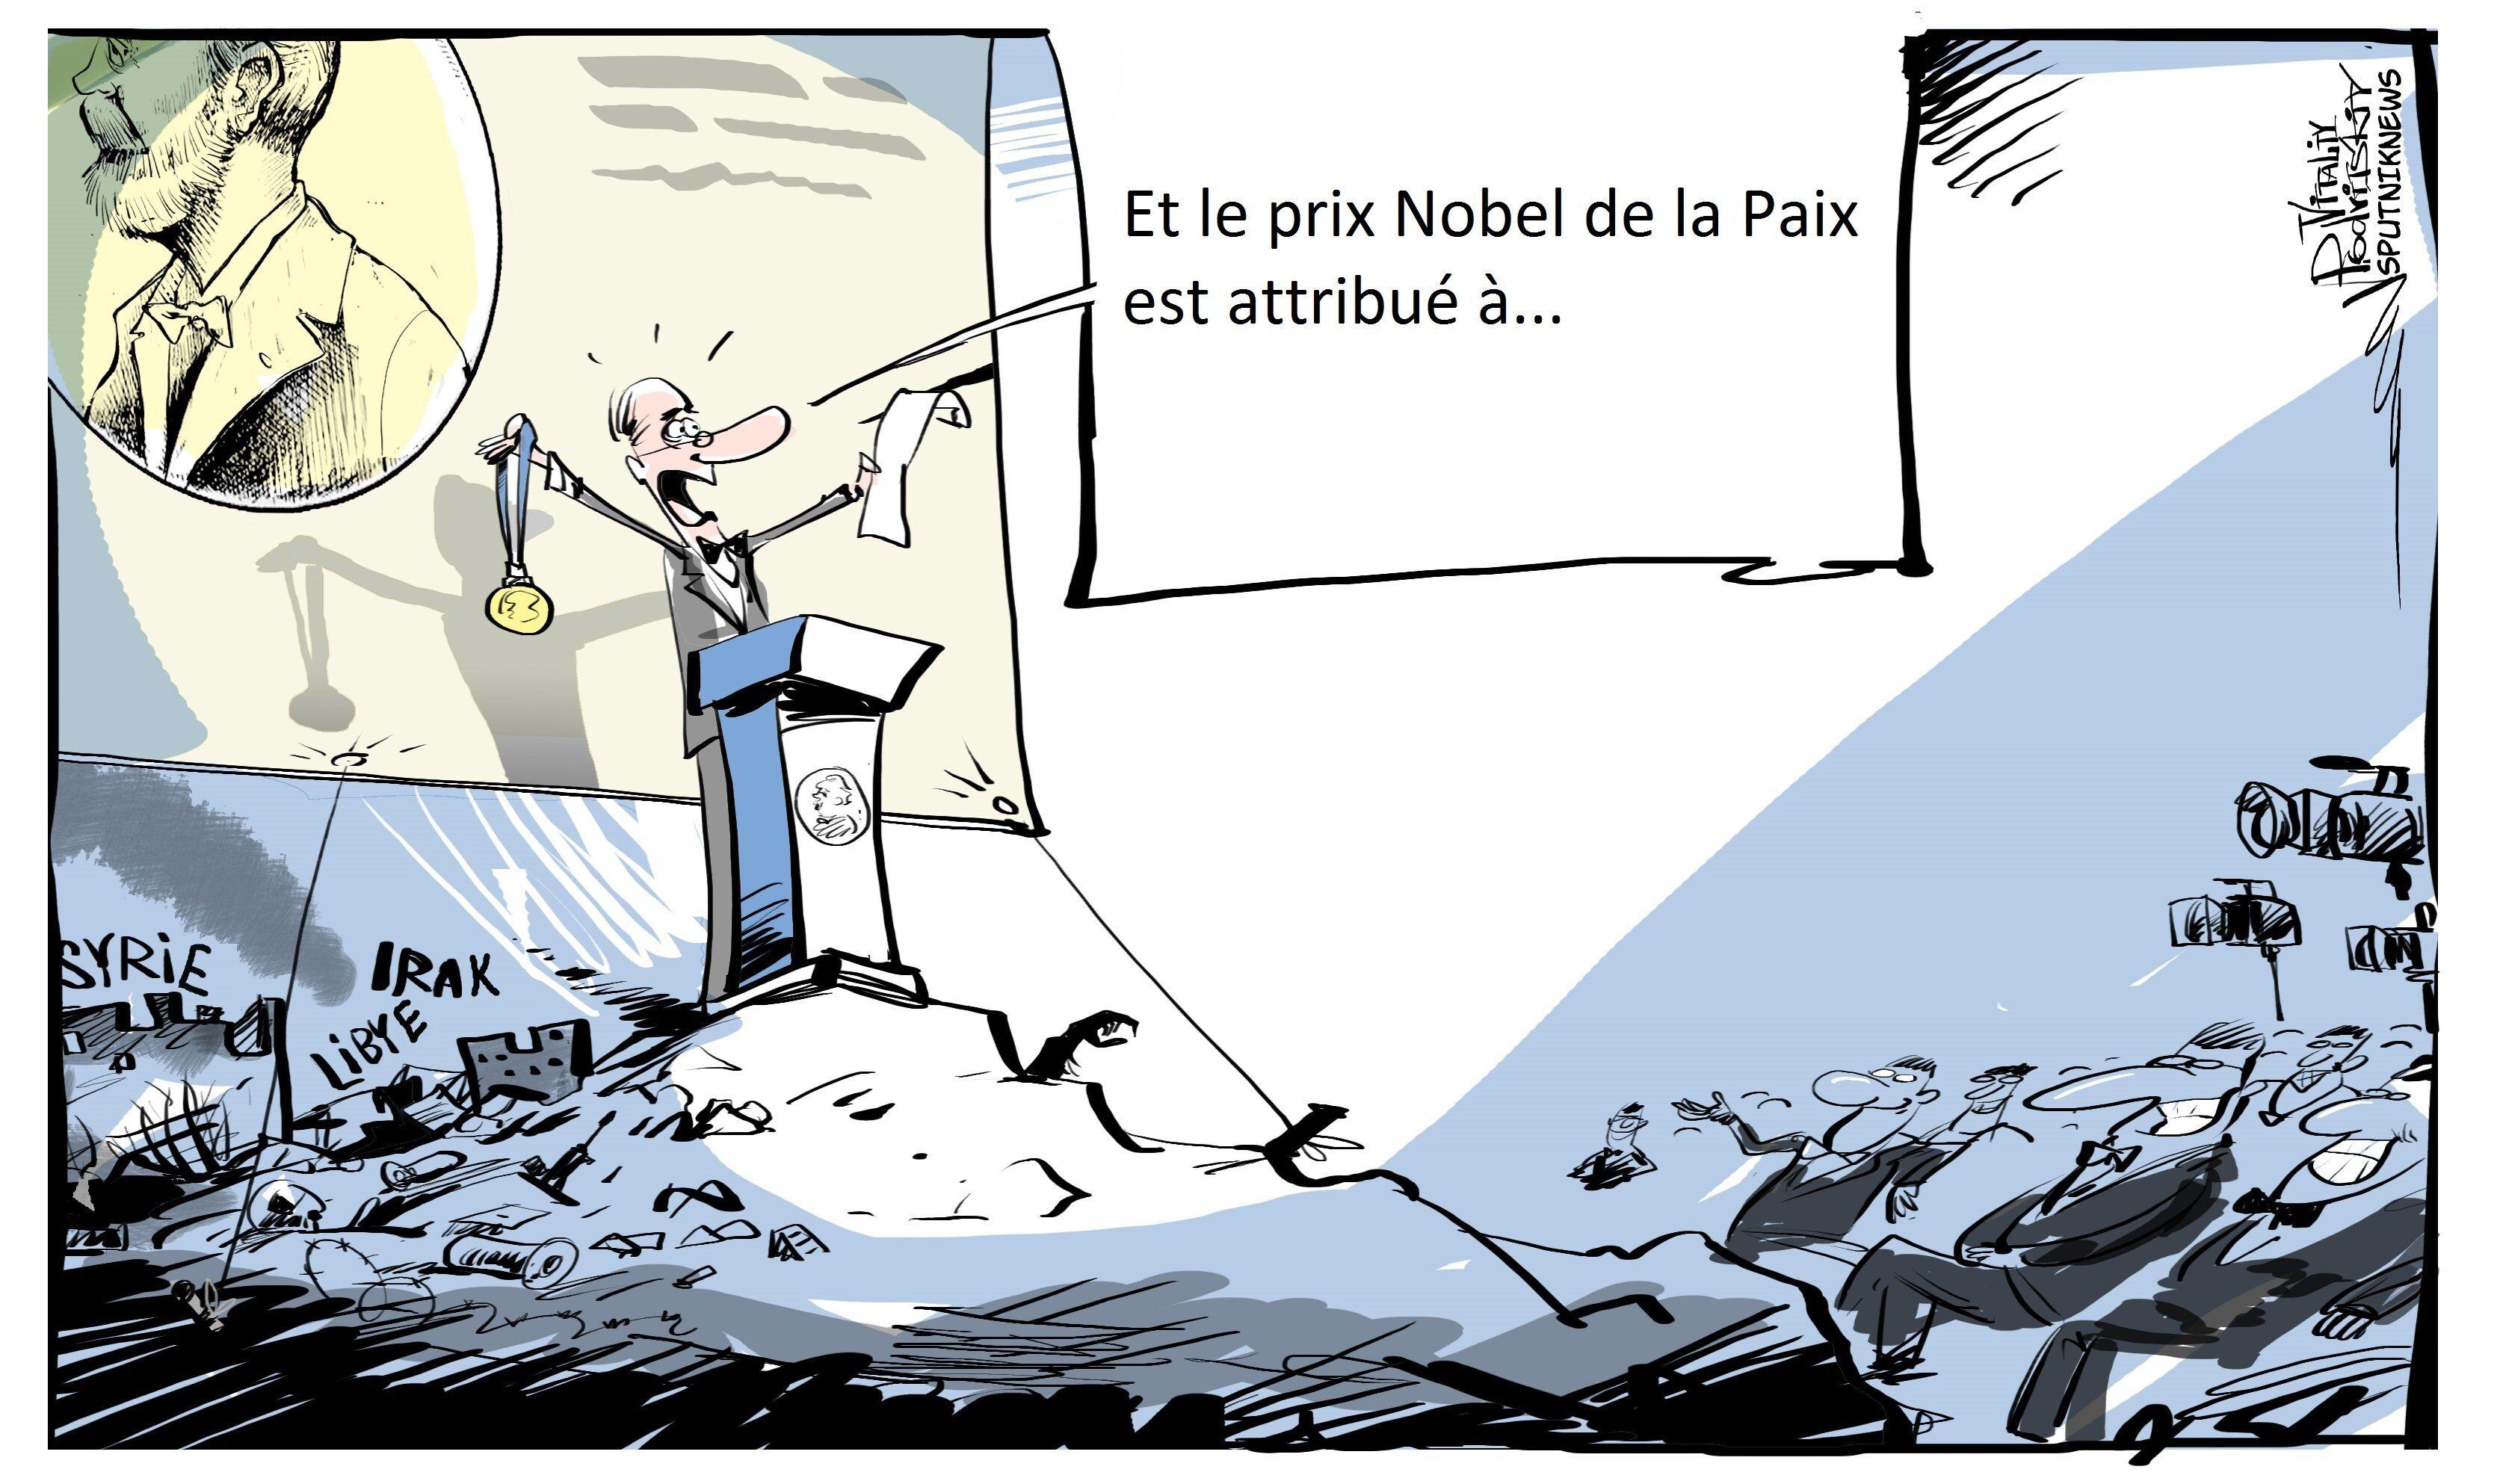 Fabius de la Paix : l'ancien chef de la diplomatie vise le Prix Nobel